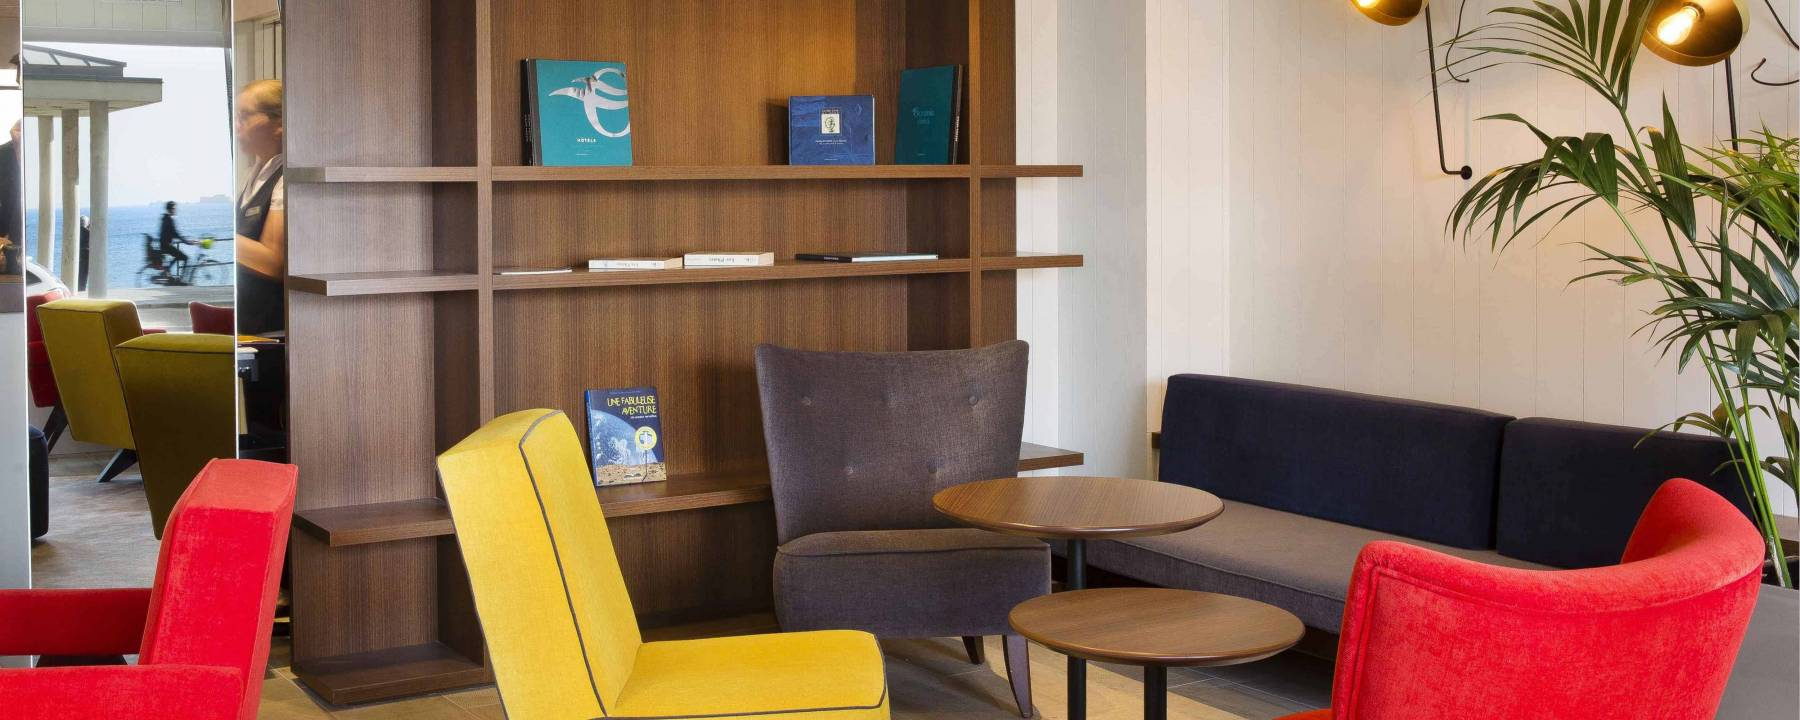 Hotel 3 etoiles Escale Oceania Saint Malo - Lobby.jpg